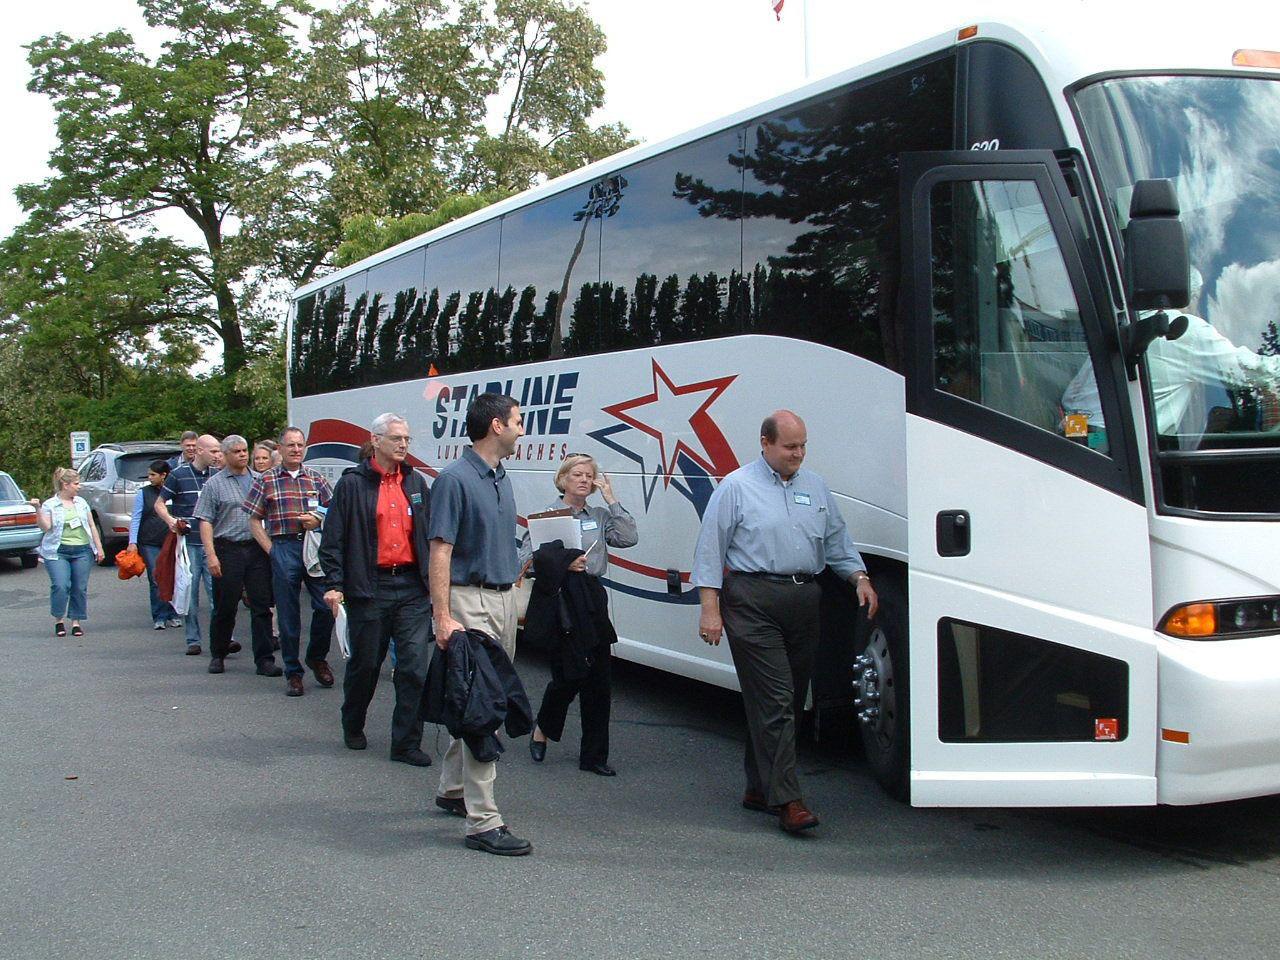 Аренда и заказ автобусов в Одессе от 350 грн.